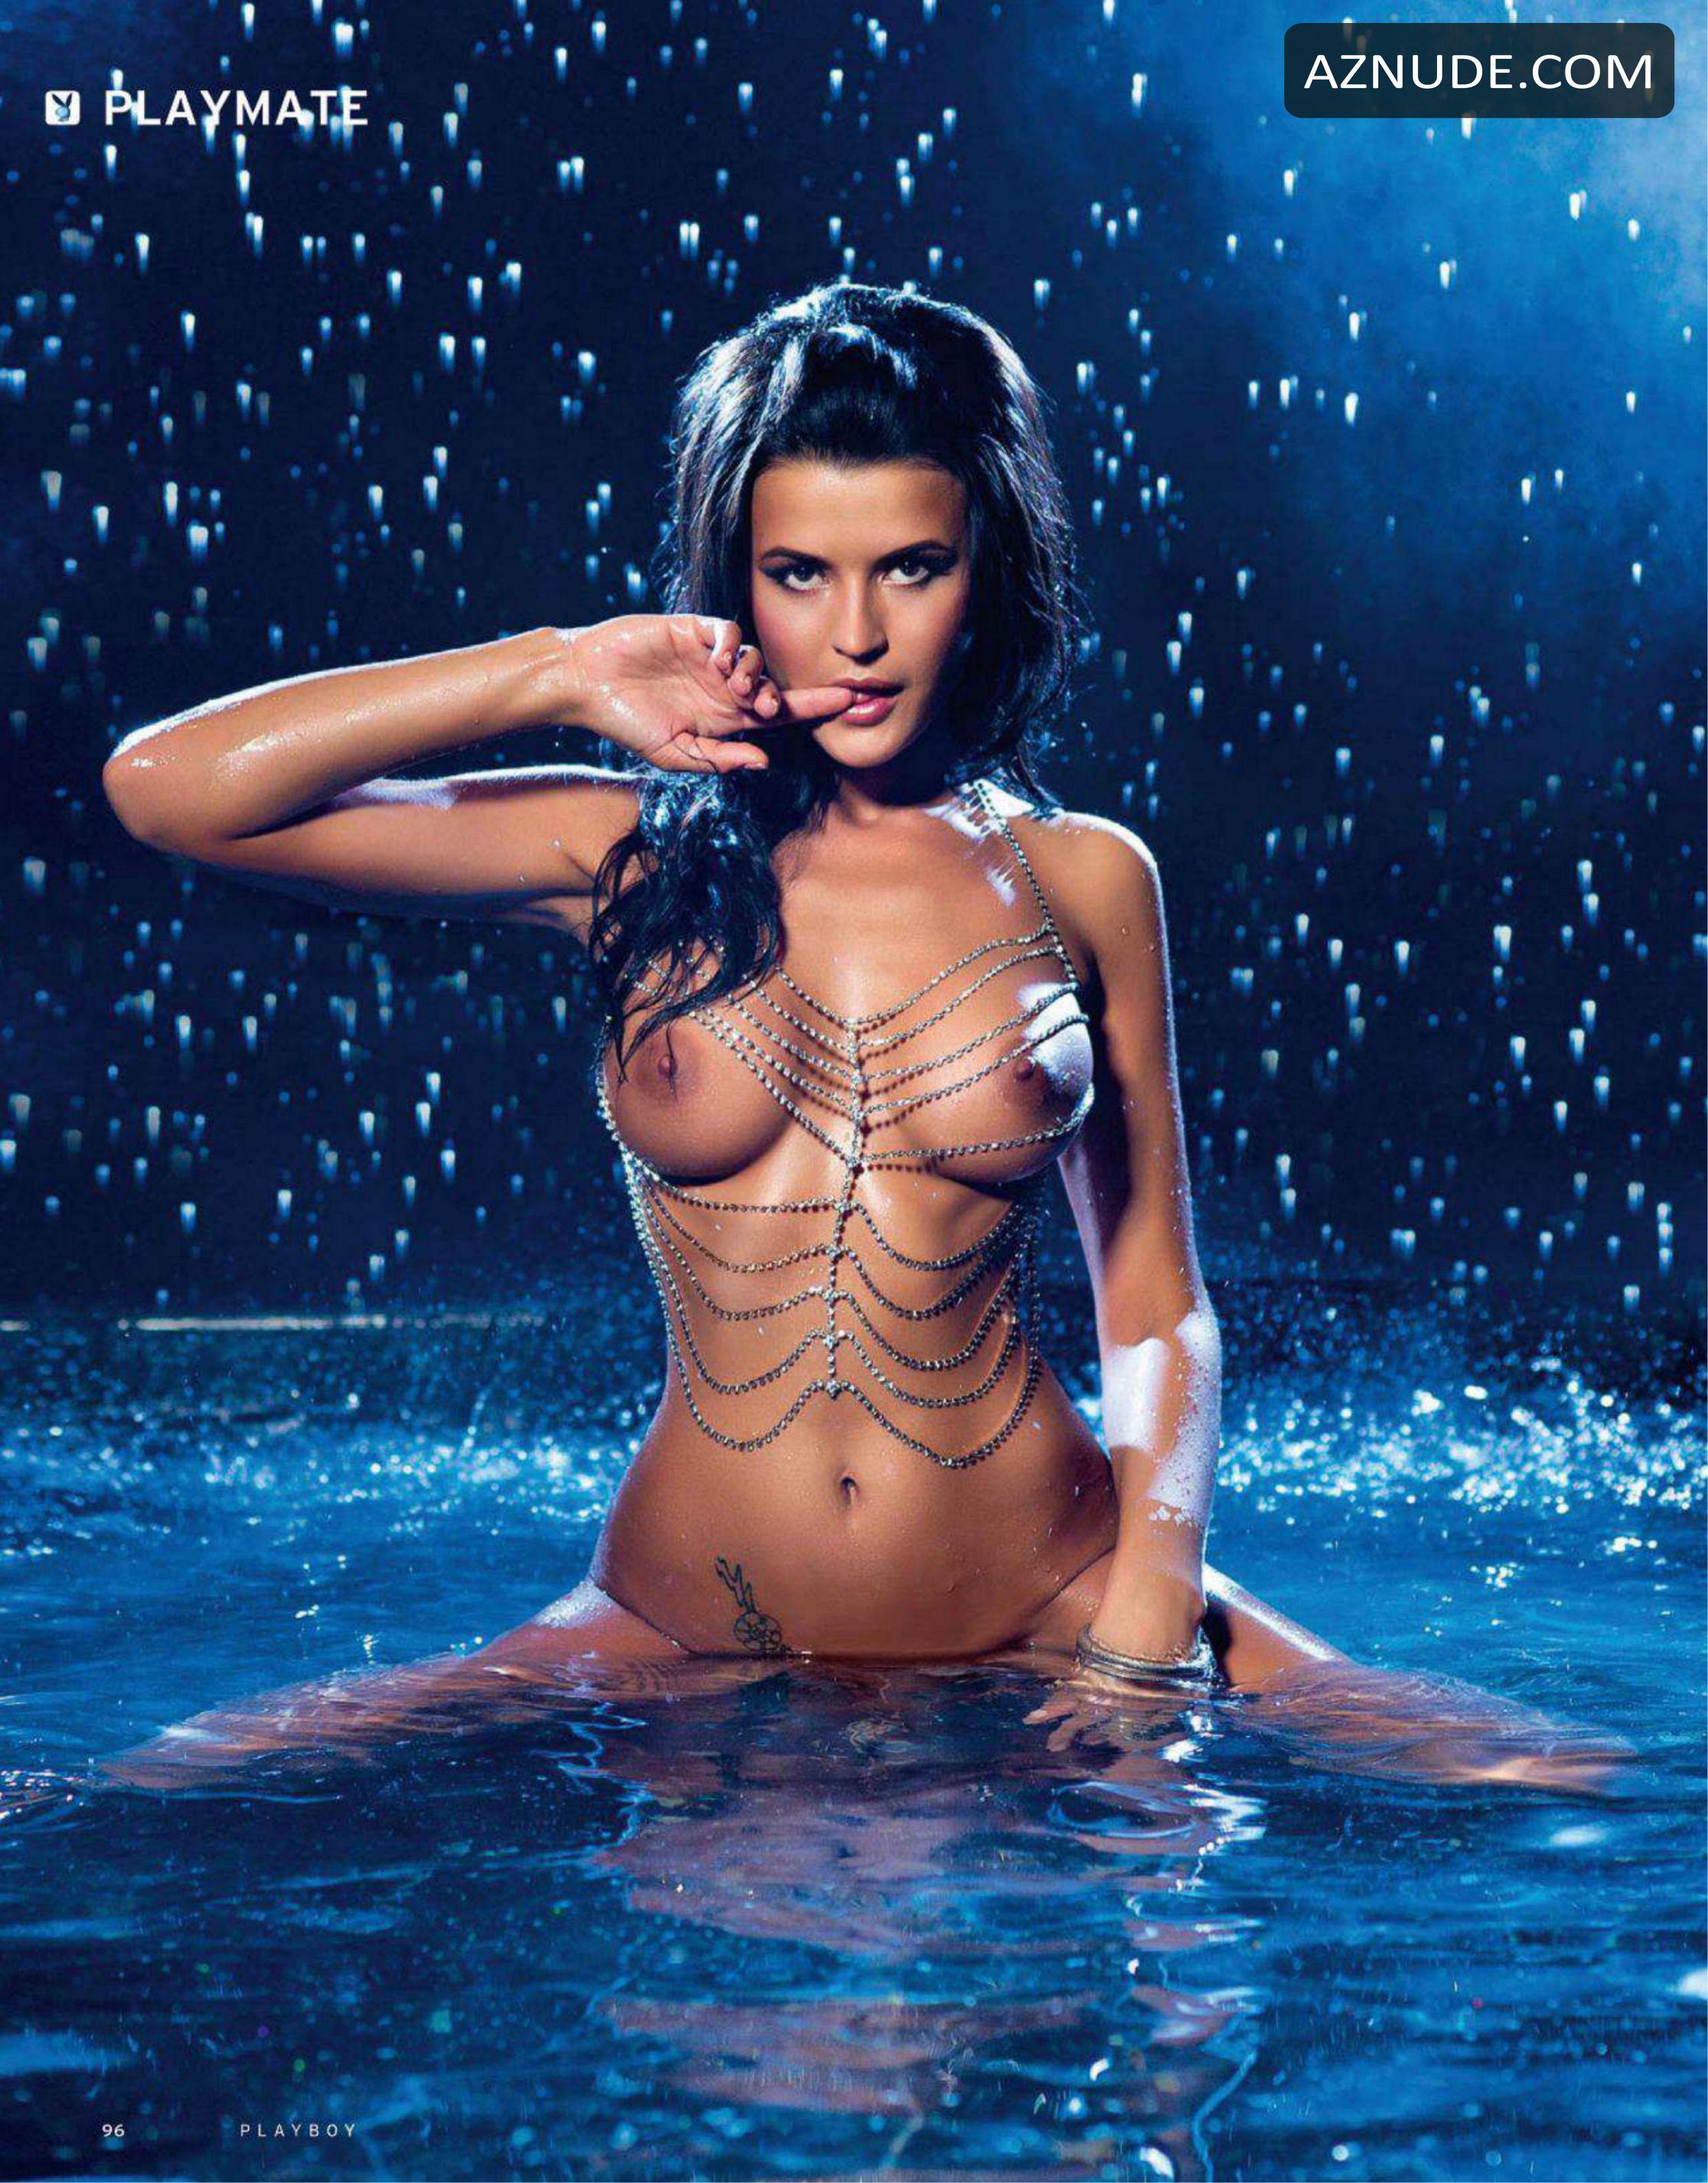 Oksana Bondarenko Nude And Sexy For Playboy - Aznude-9764